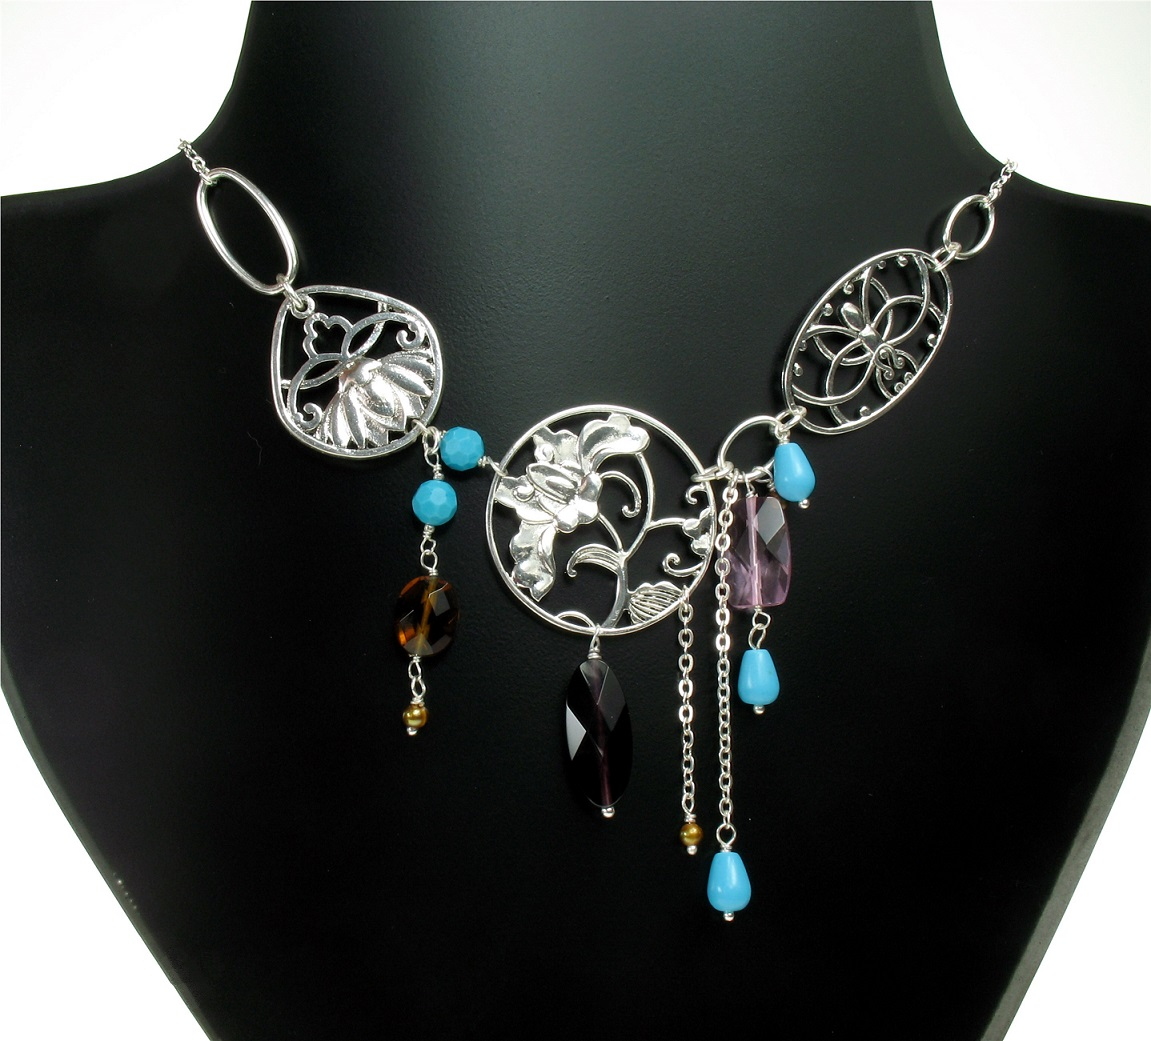 PILGRIM - Filigree Summer - Flower Panel Necklace - Silver Plate/Multi-Colours BNWT